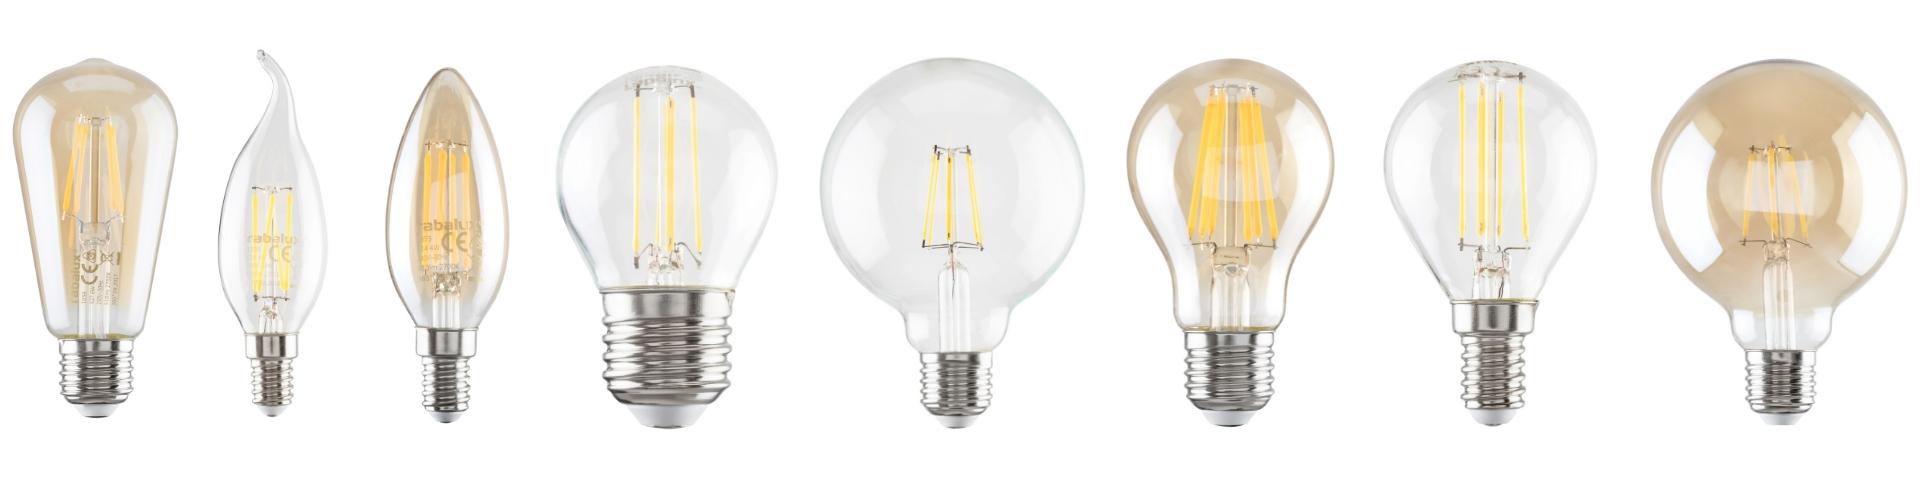 Żarówki LED Filament